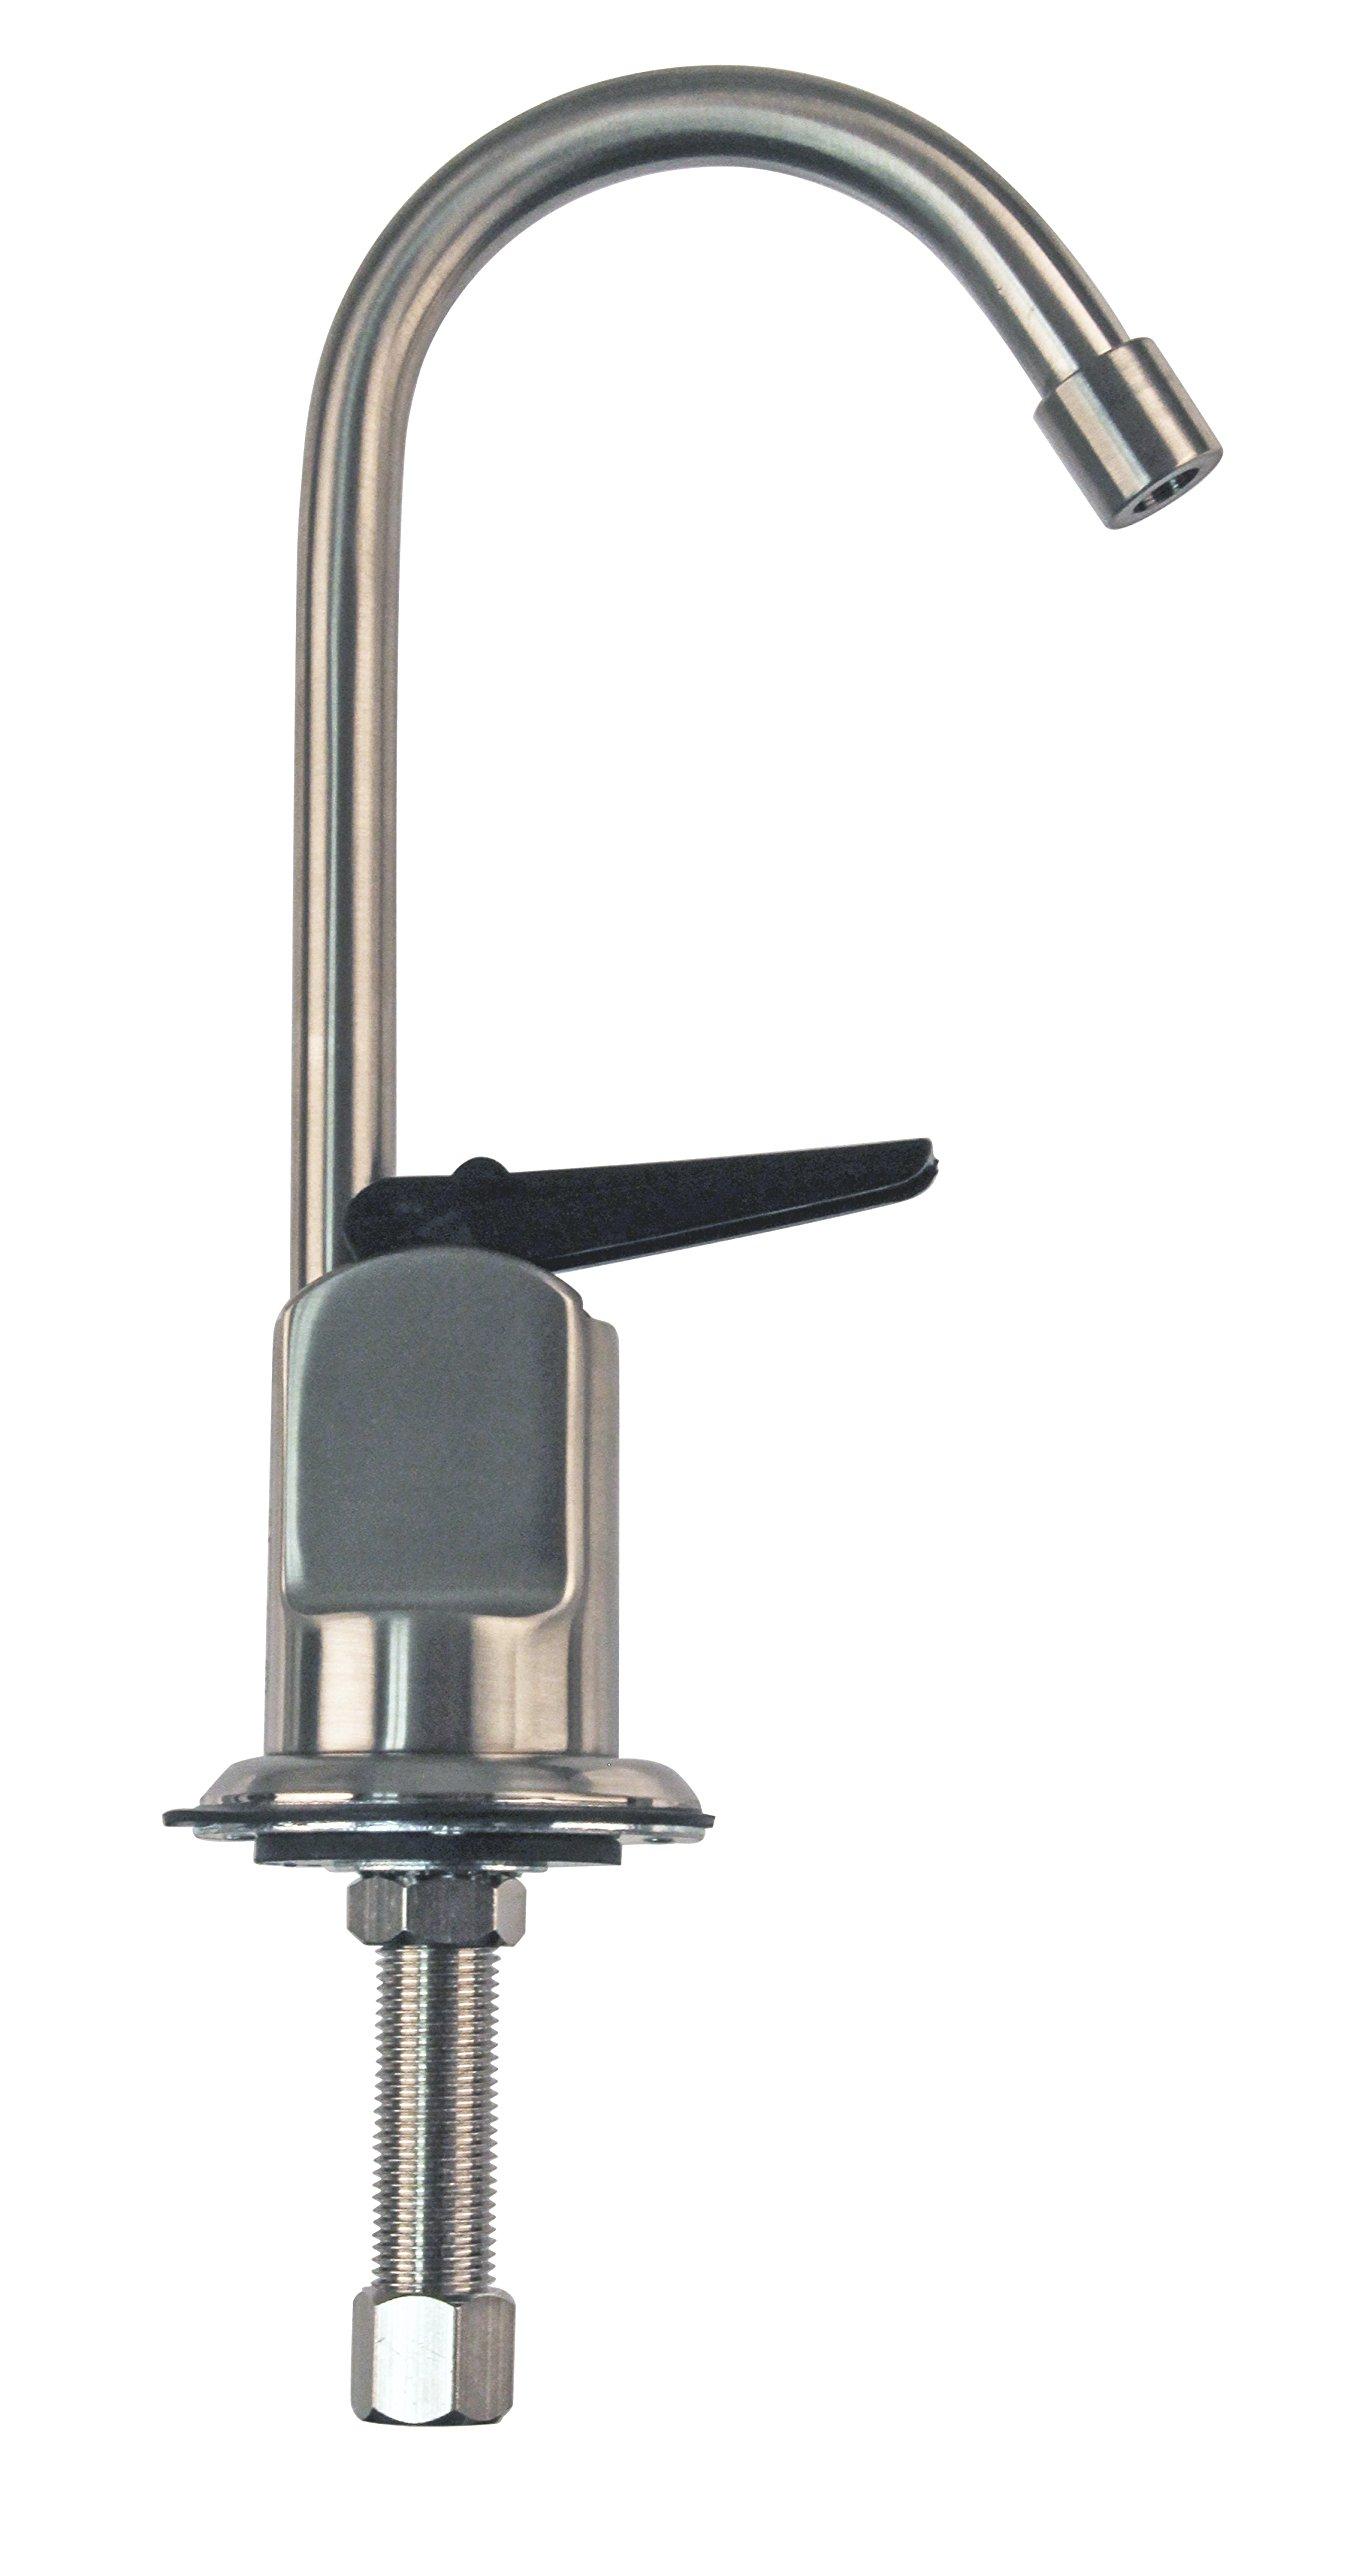 Westbrass R203-NL-07 Water Dispenser, Satin Nickel